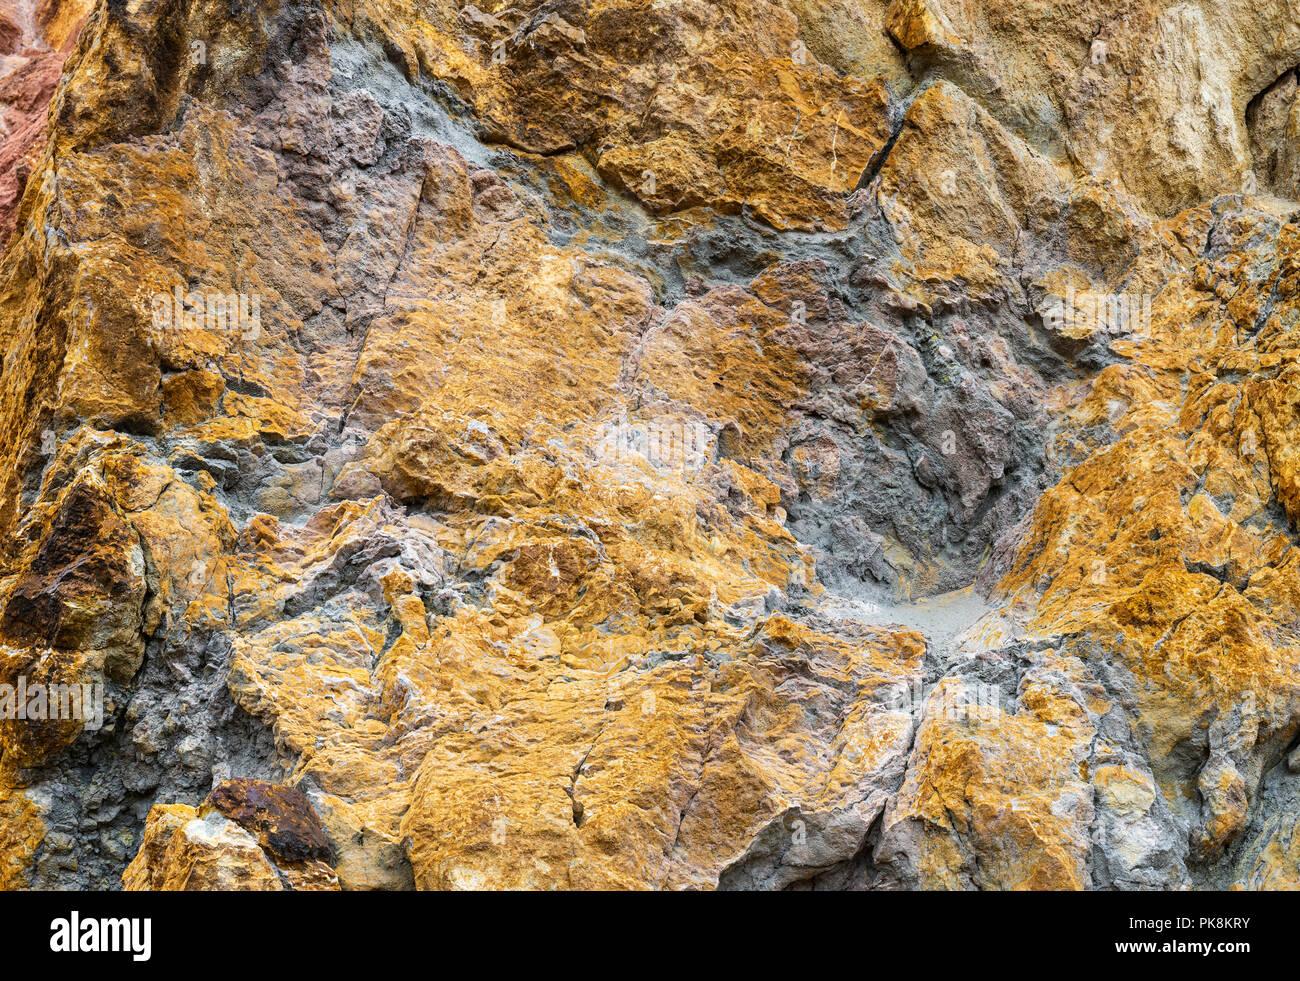 Kupfer Erzlagerstätten in Felsen an Parys Mountain Kupfermine, Anglesey, Wales Stockbild